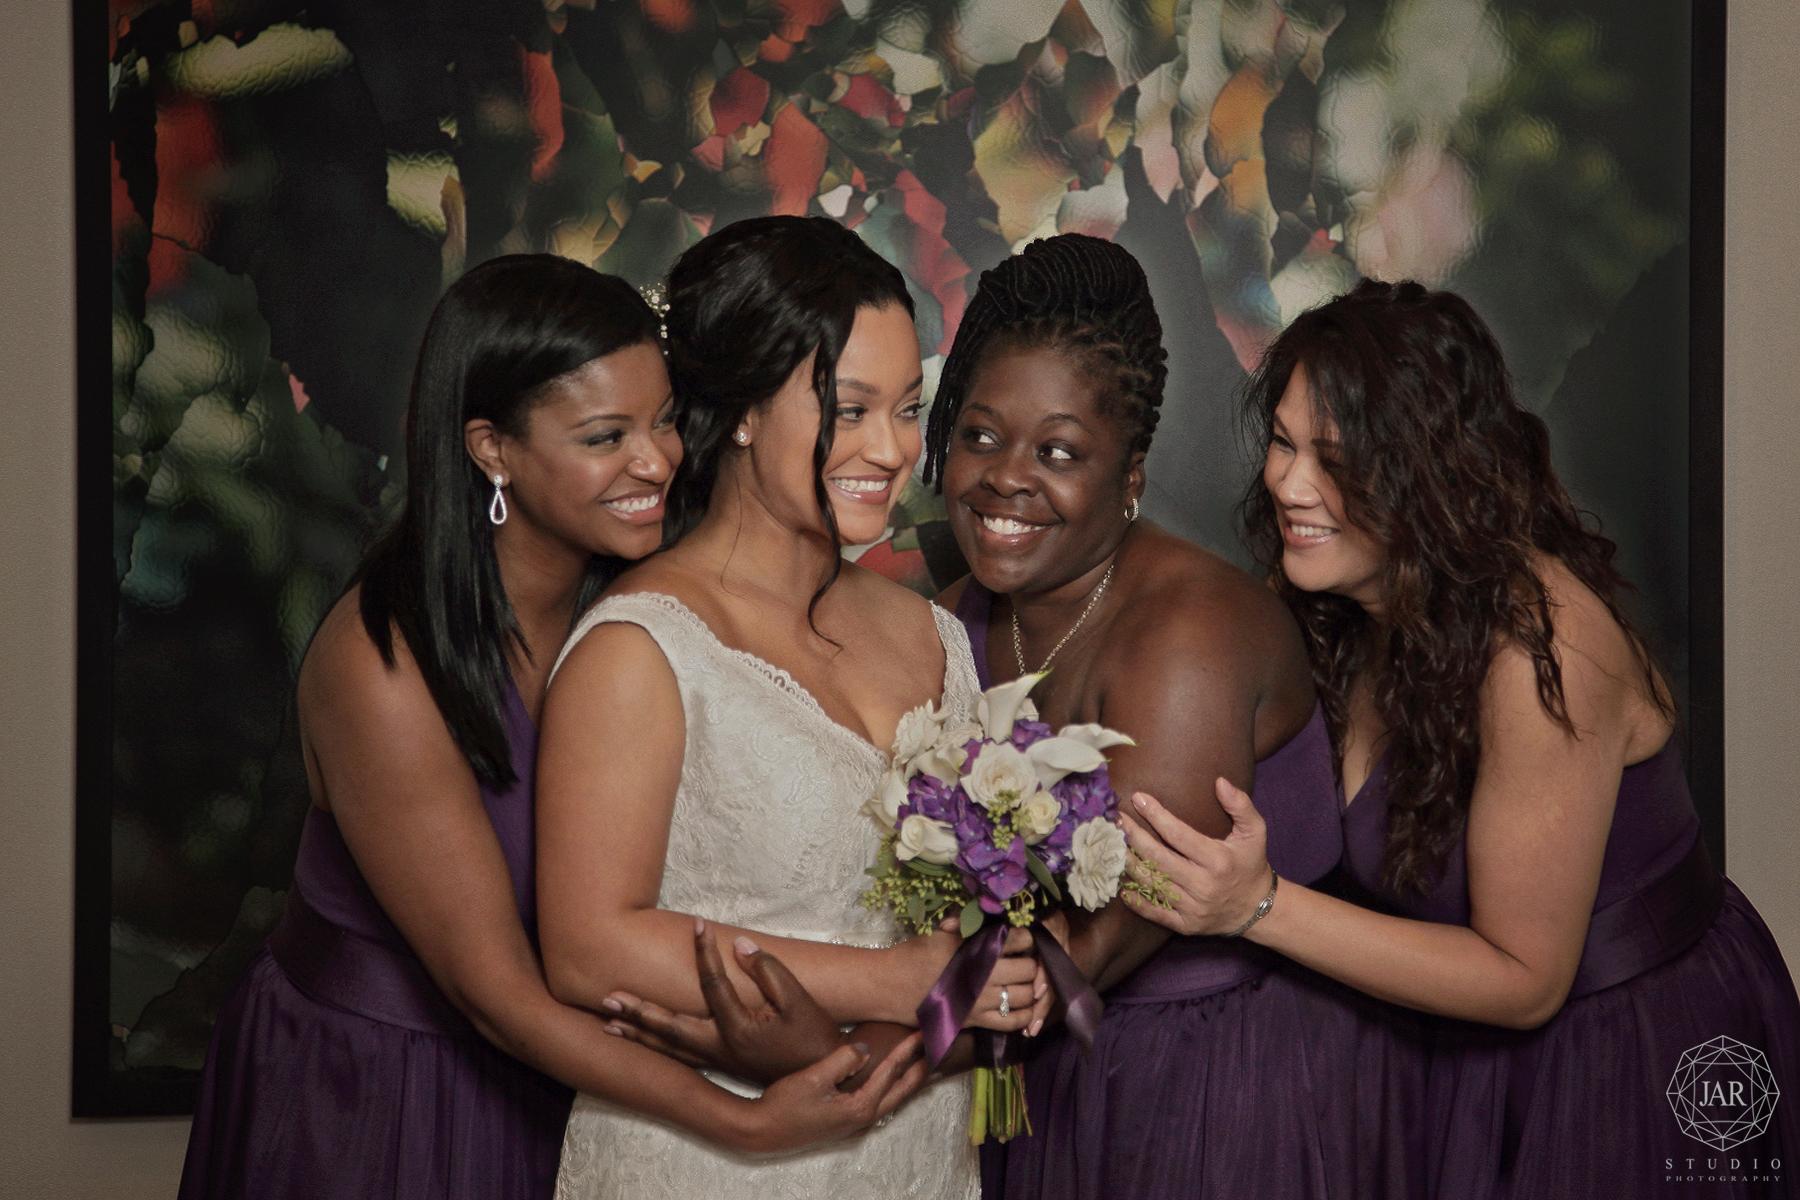 07-bridesmaid-fun-orlando-photography-jarstudio.JPG